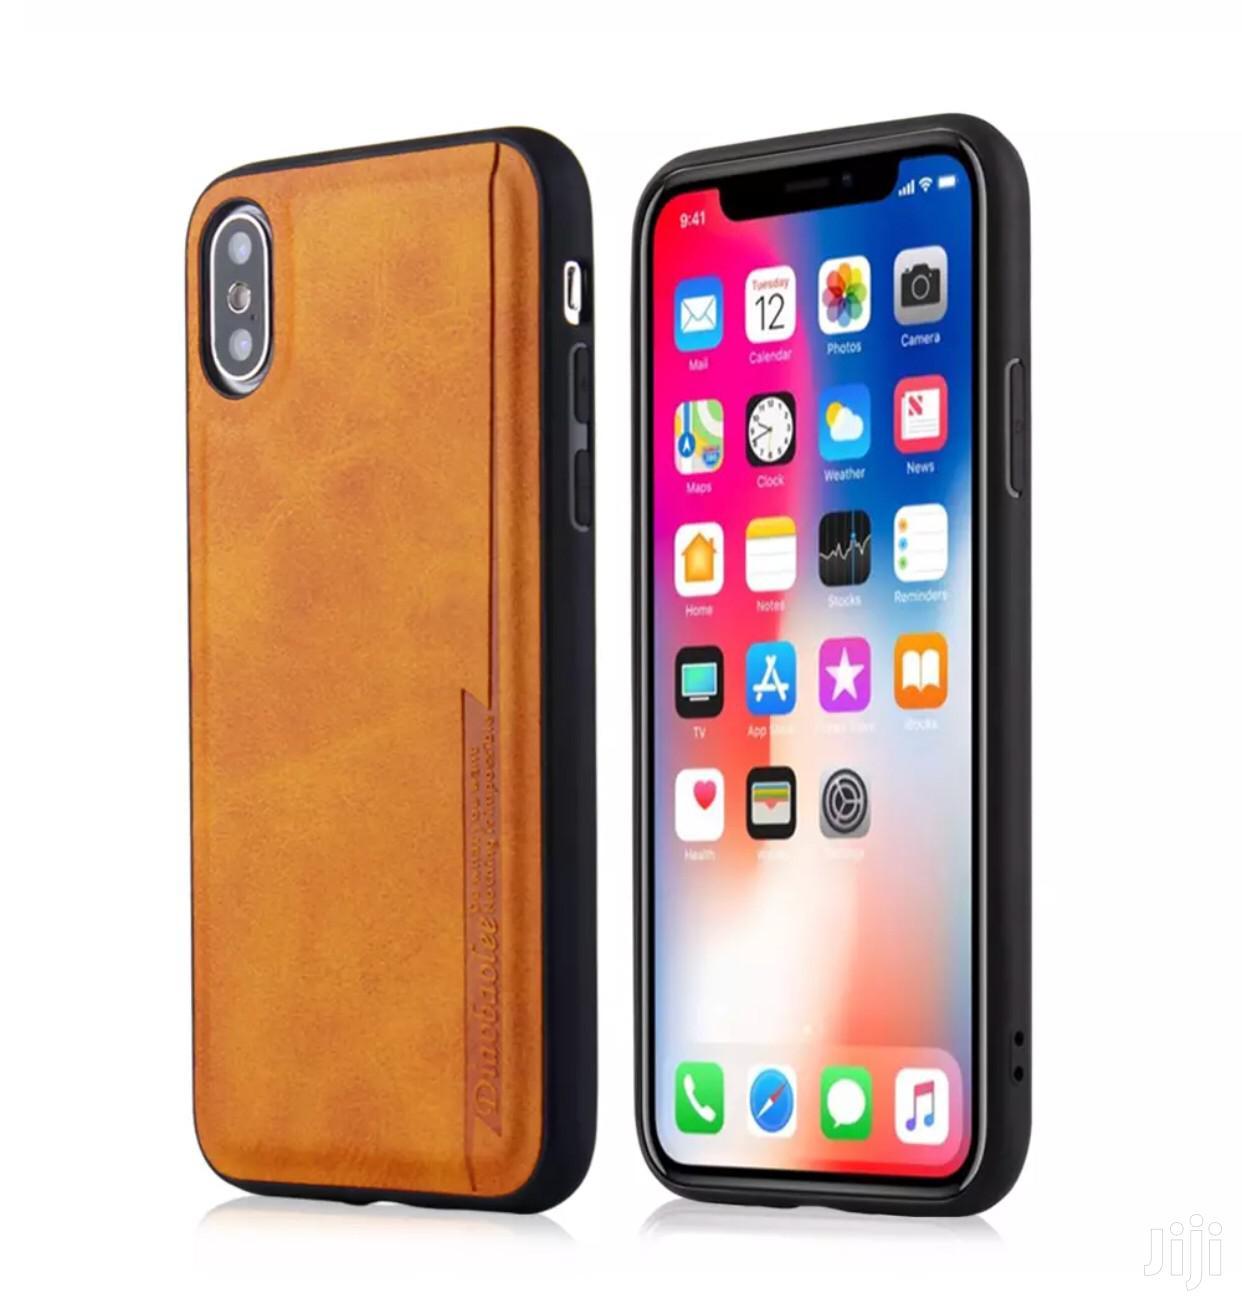 Leather Case 4 iPhone 11promax 11pro 1 Xsmax Xr Xs X 8p 7p 6plus 8 7 6